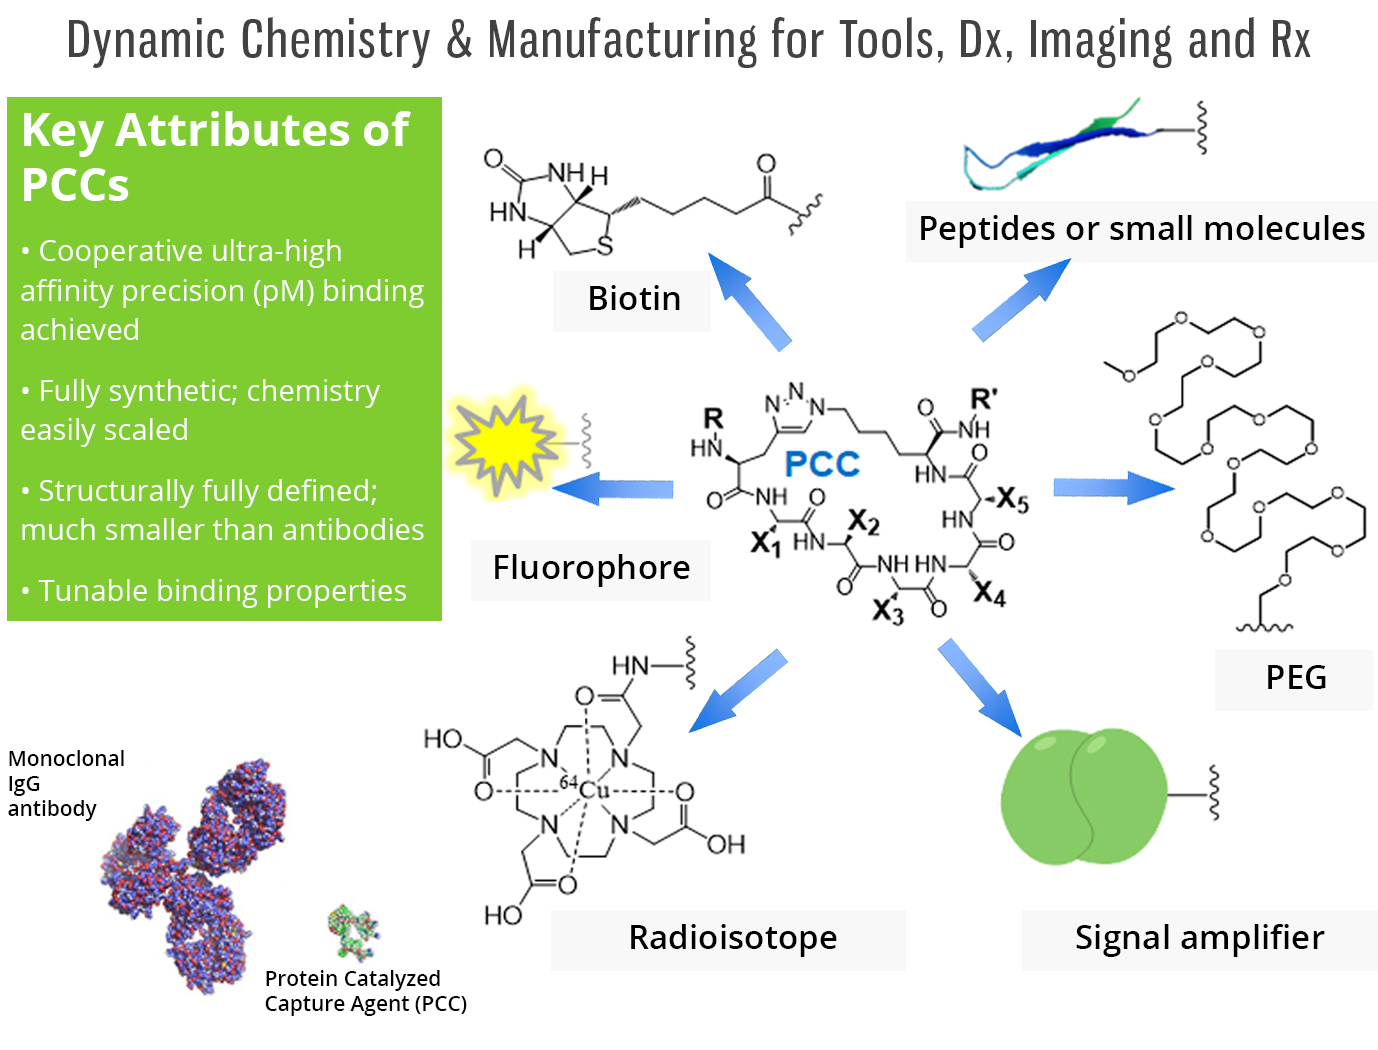 Image 5 Dynamic Chemistry Version 3.jpg